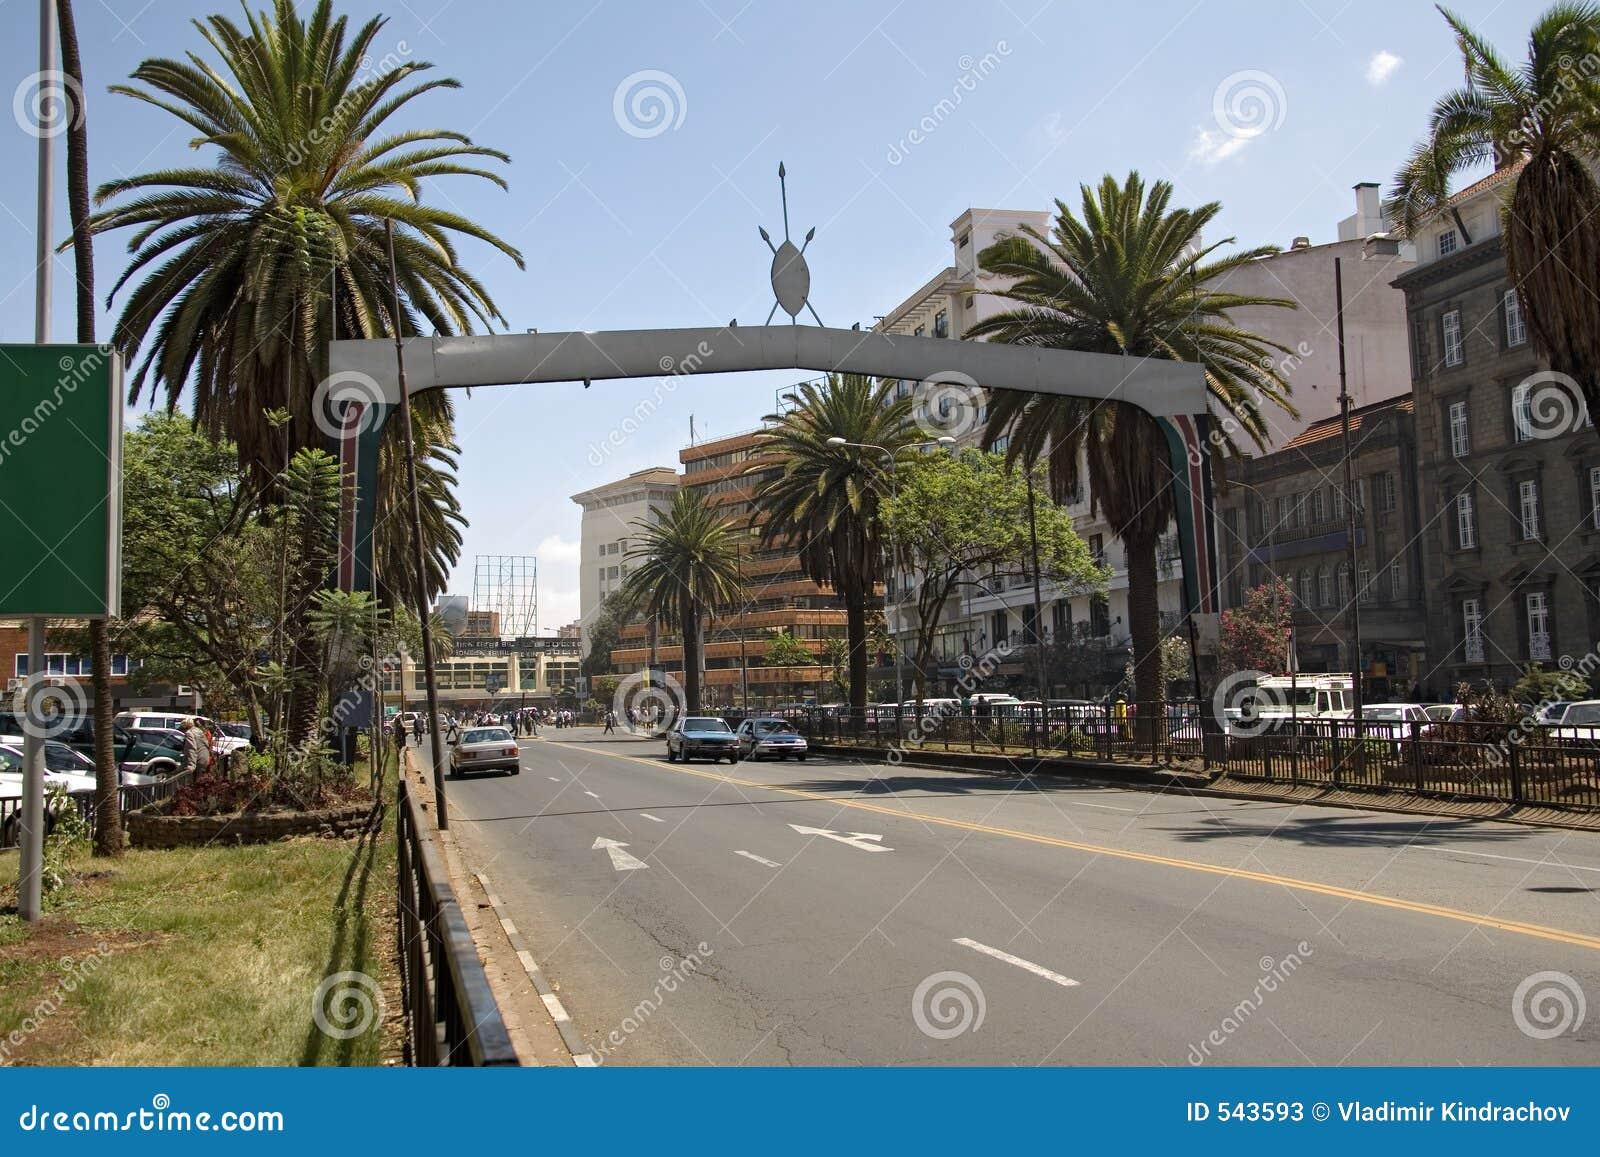 Download 003内罗毕 库存图片. 图片 包括有 都市风景, 历史记录, 内罗毕, 都市, 室外, 地区, 风景, 布琼布拉 - 543593